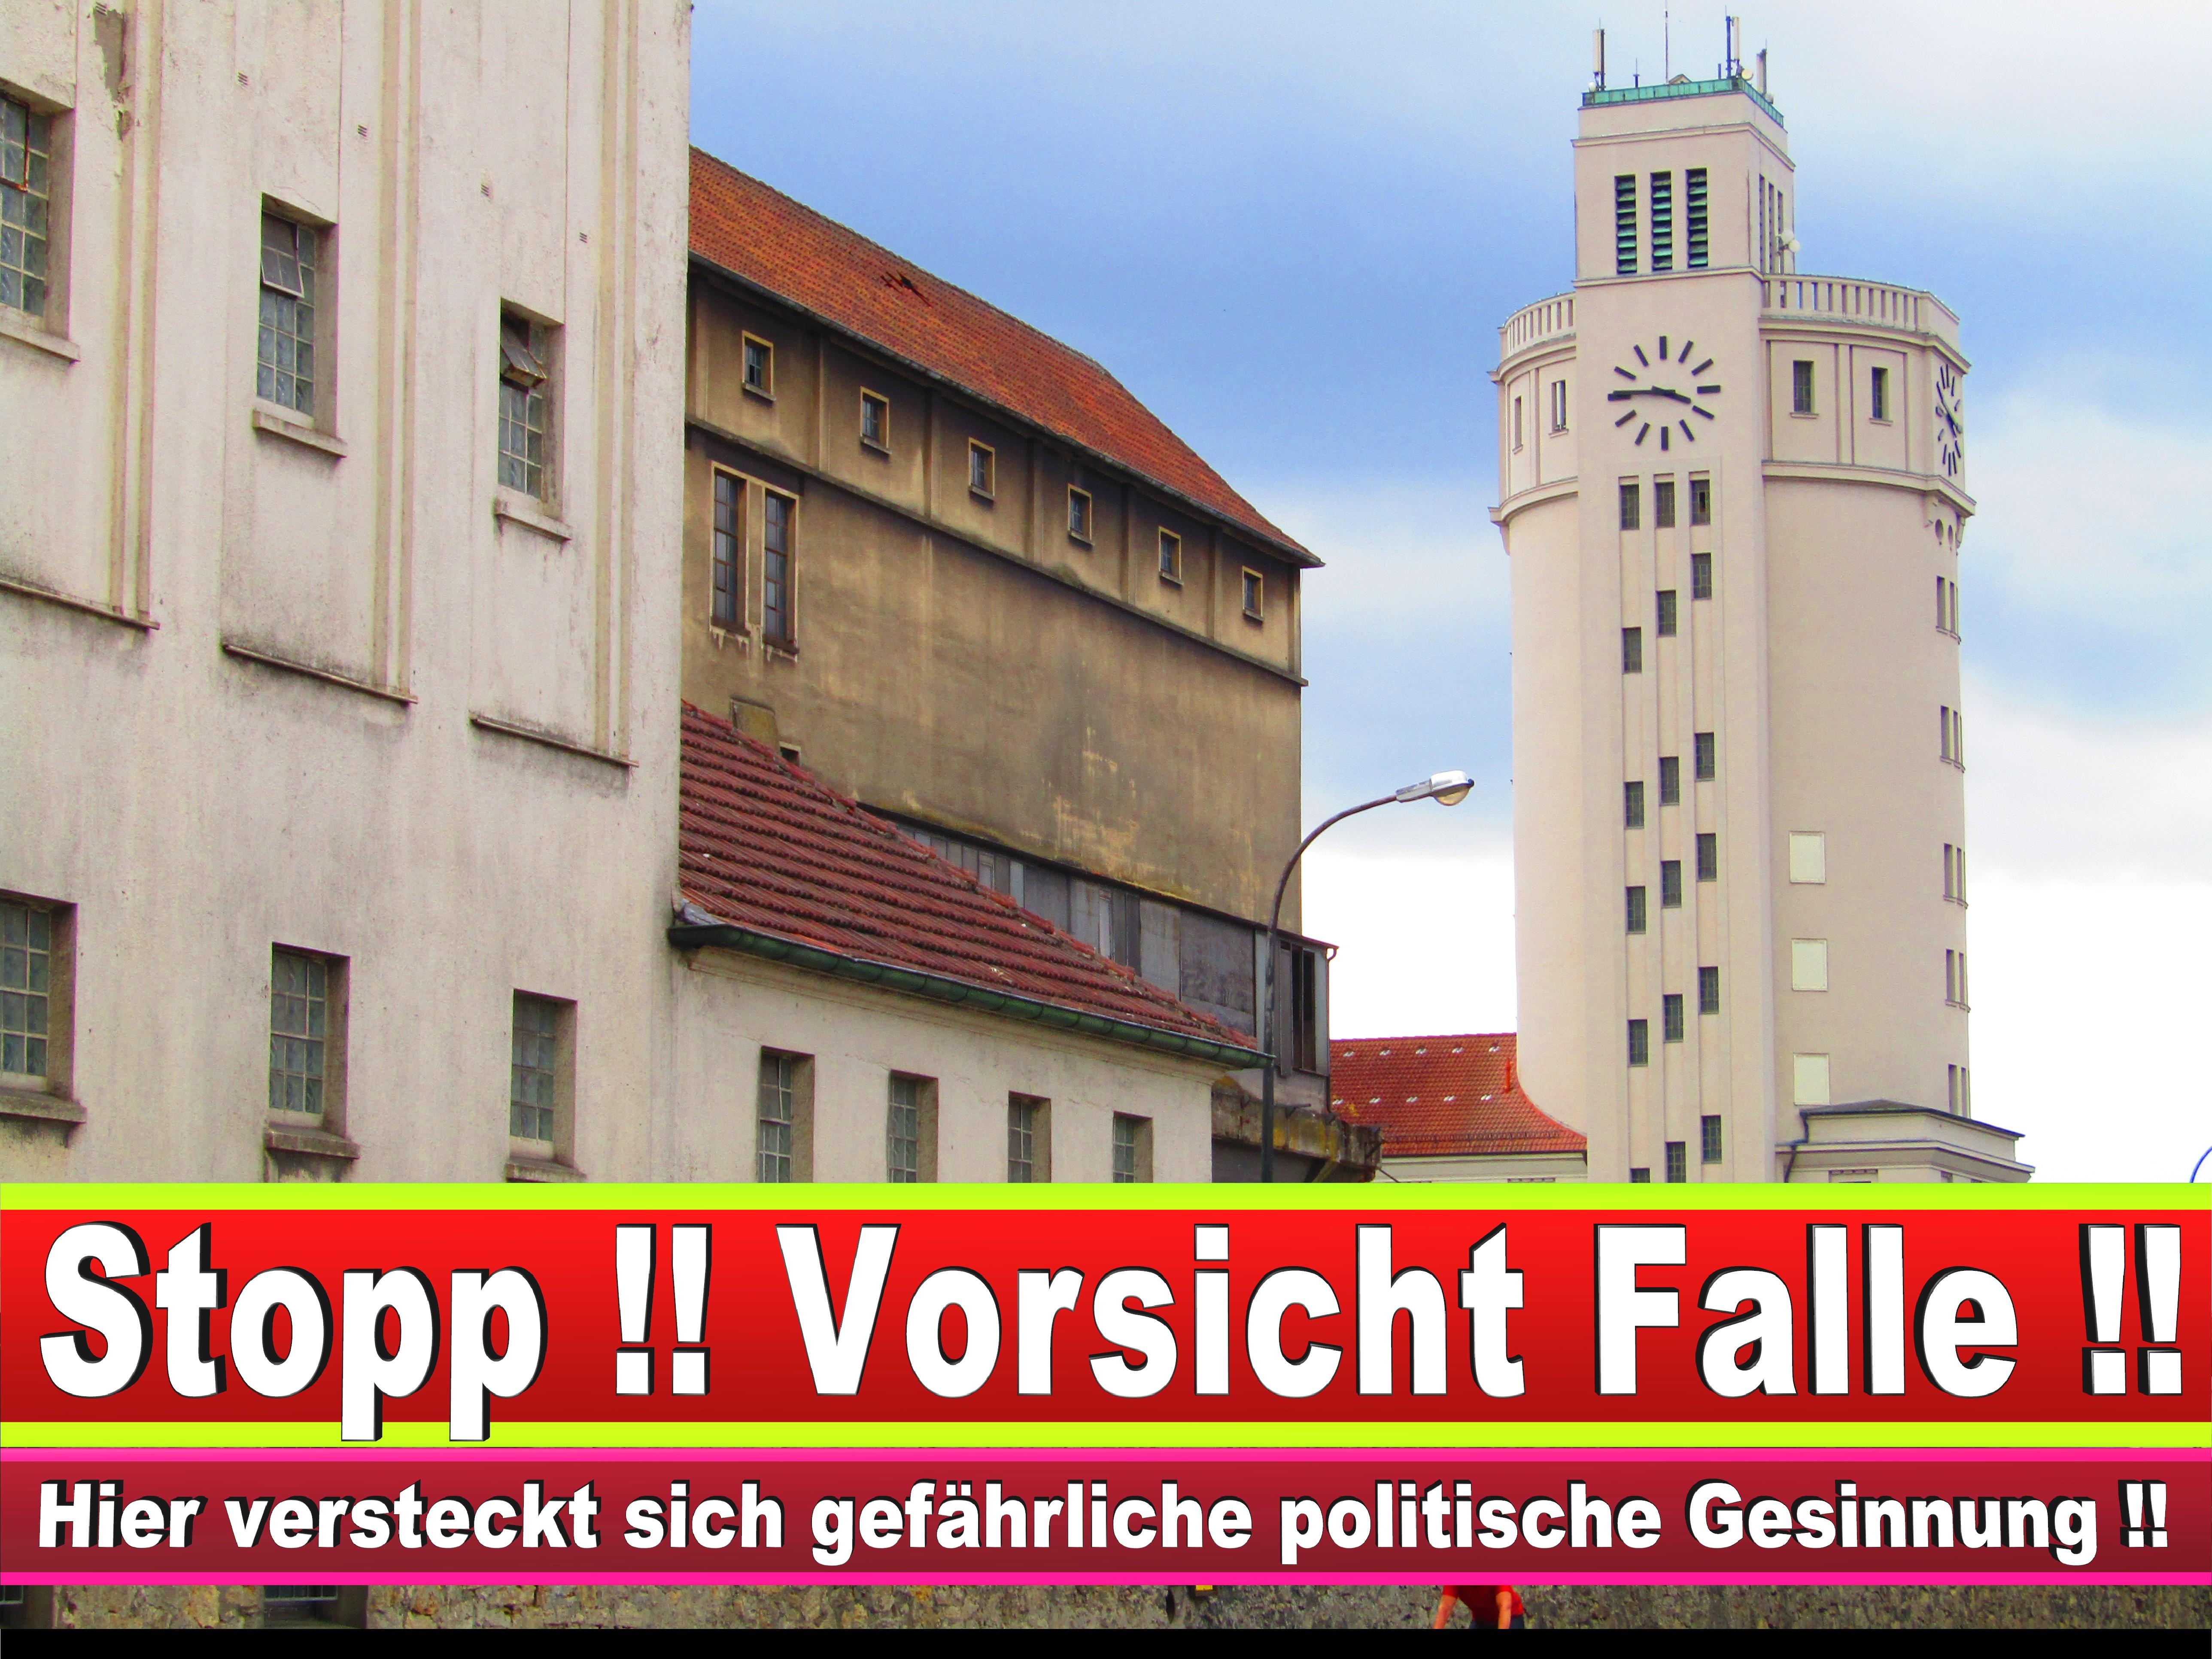 ELEKTROTECHNIK BECKMANN Franz Josef Beckmann Krackser Str 12 Bielefeld